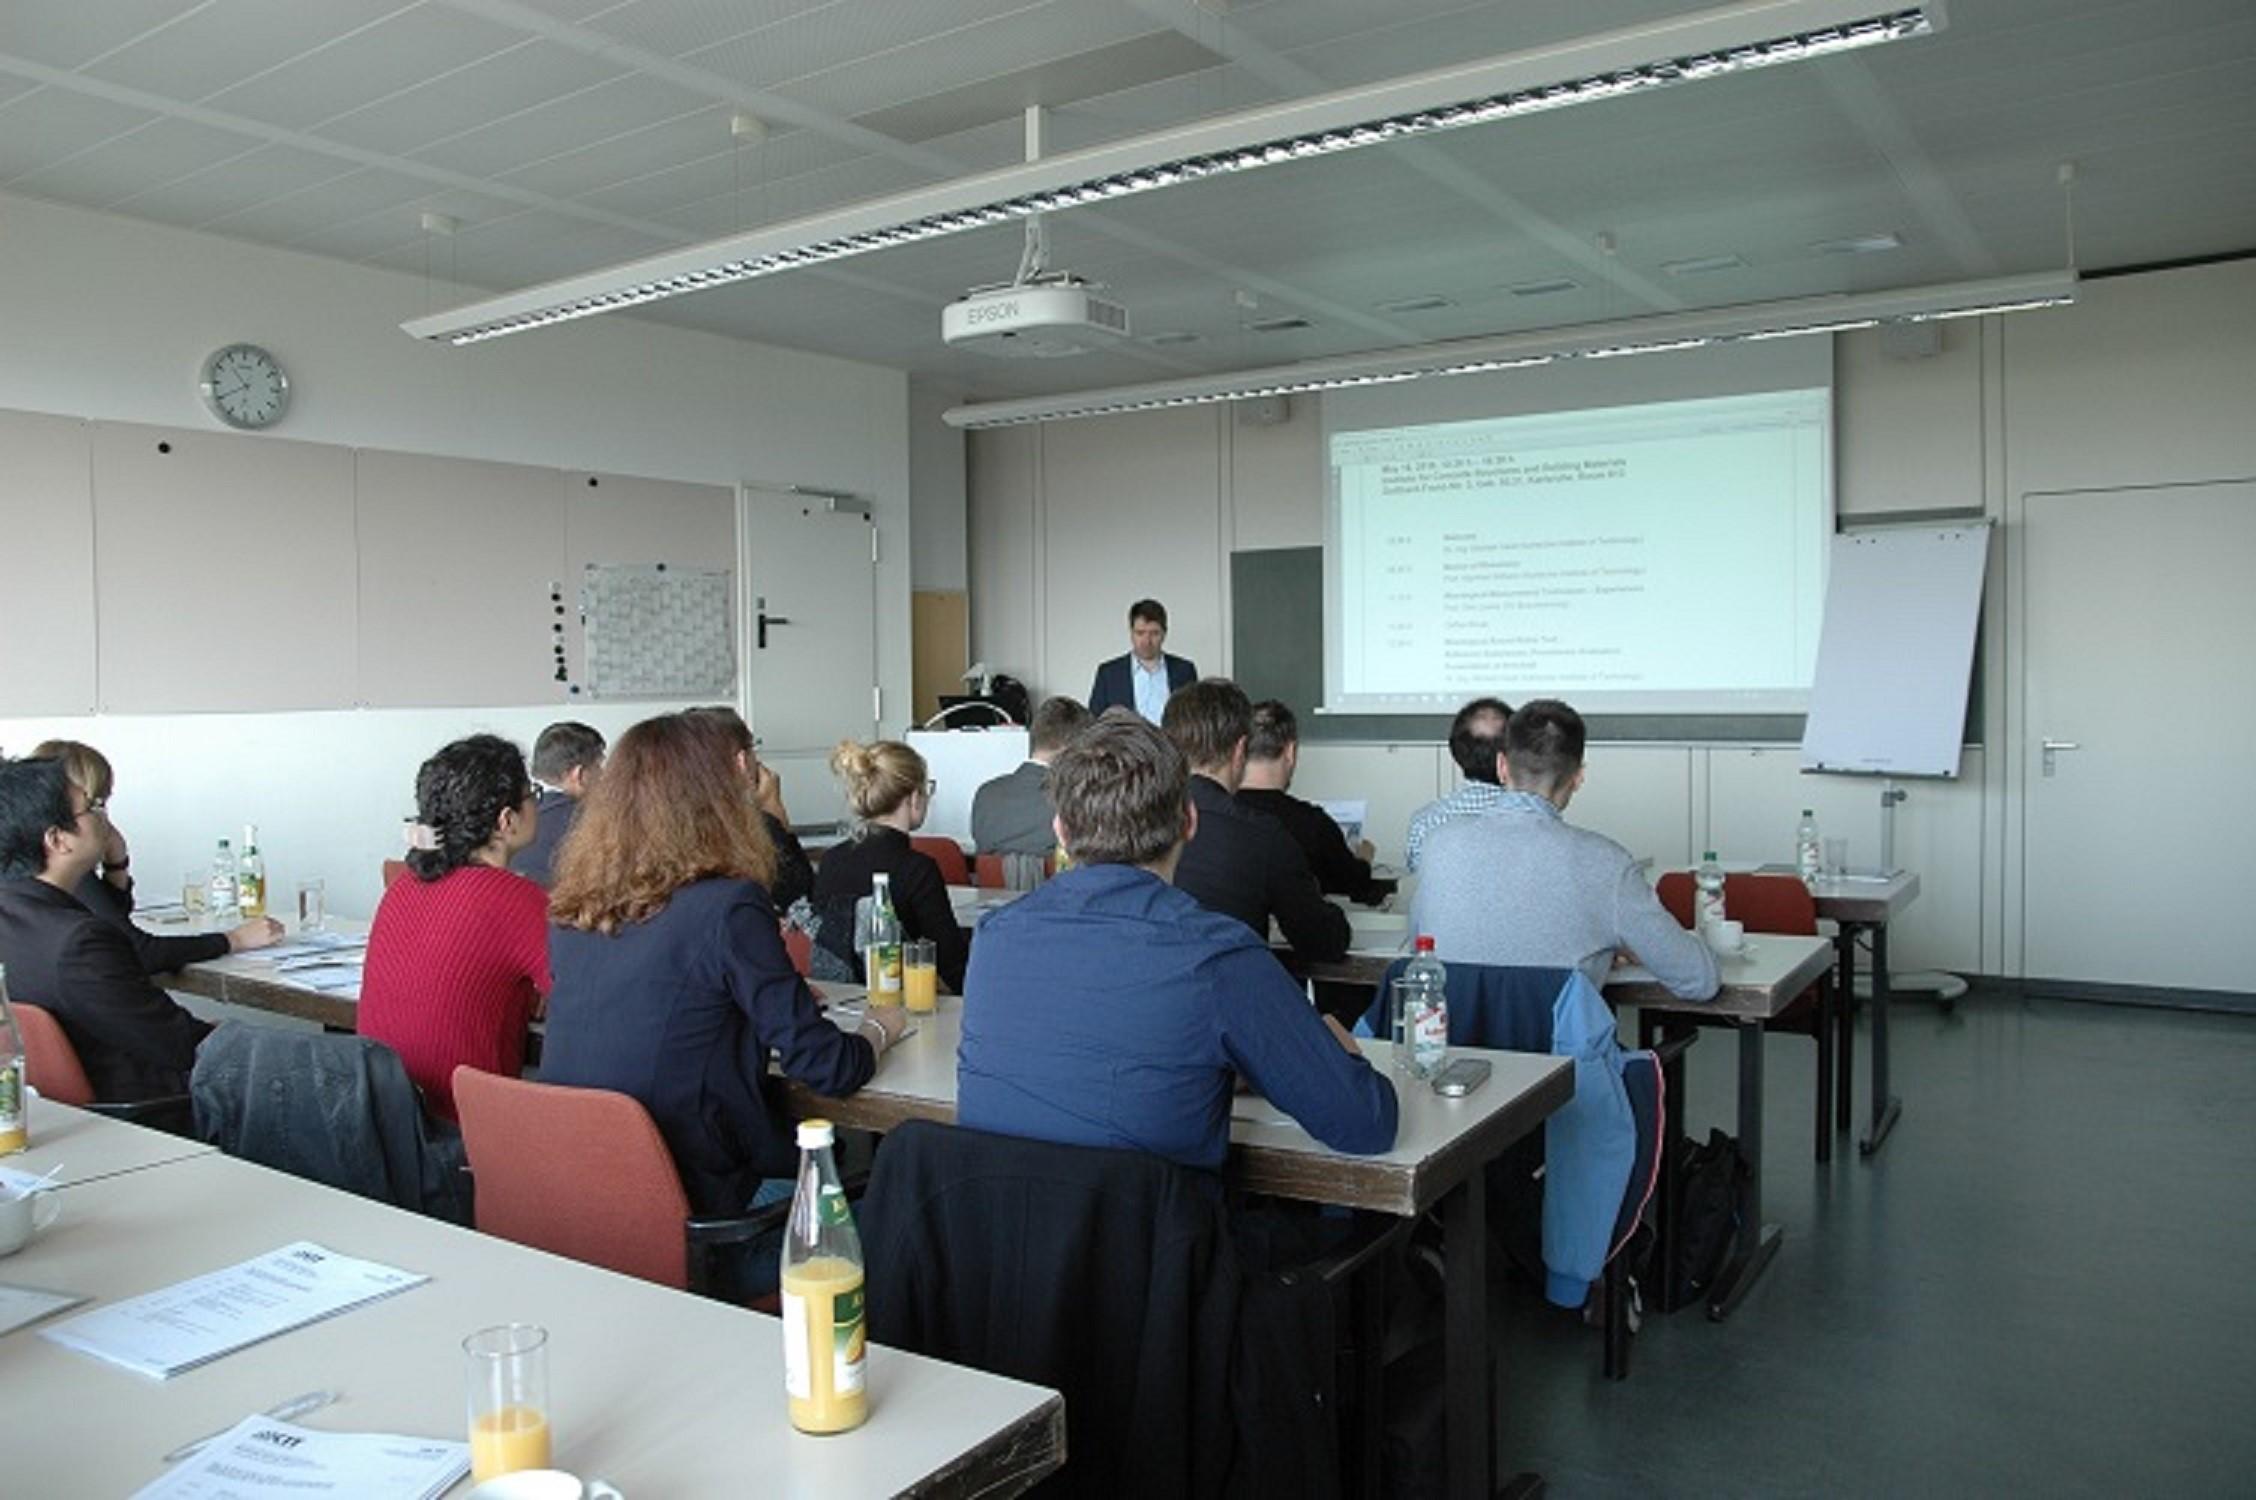 Presenation of working group rheometry